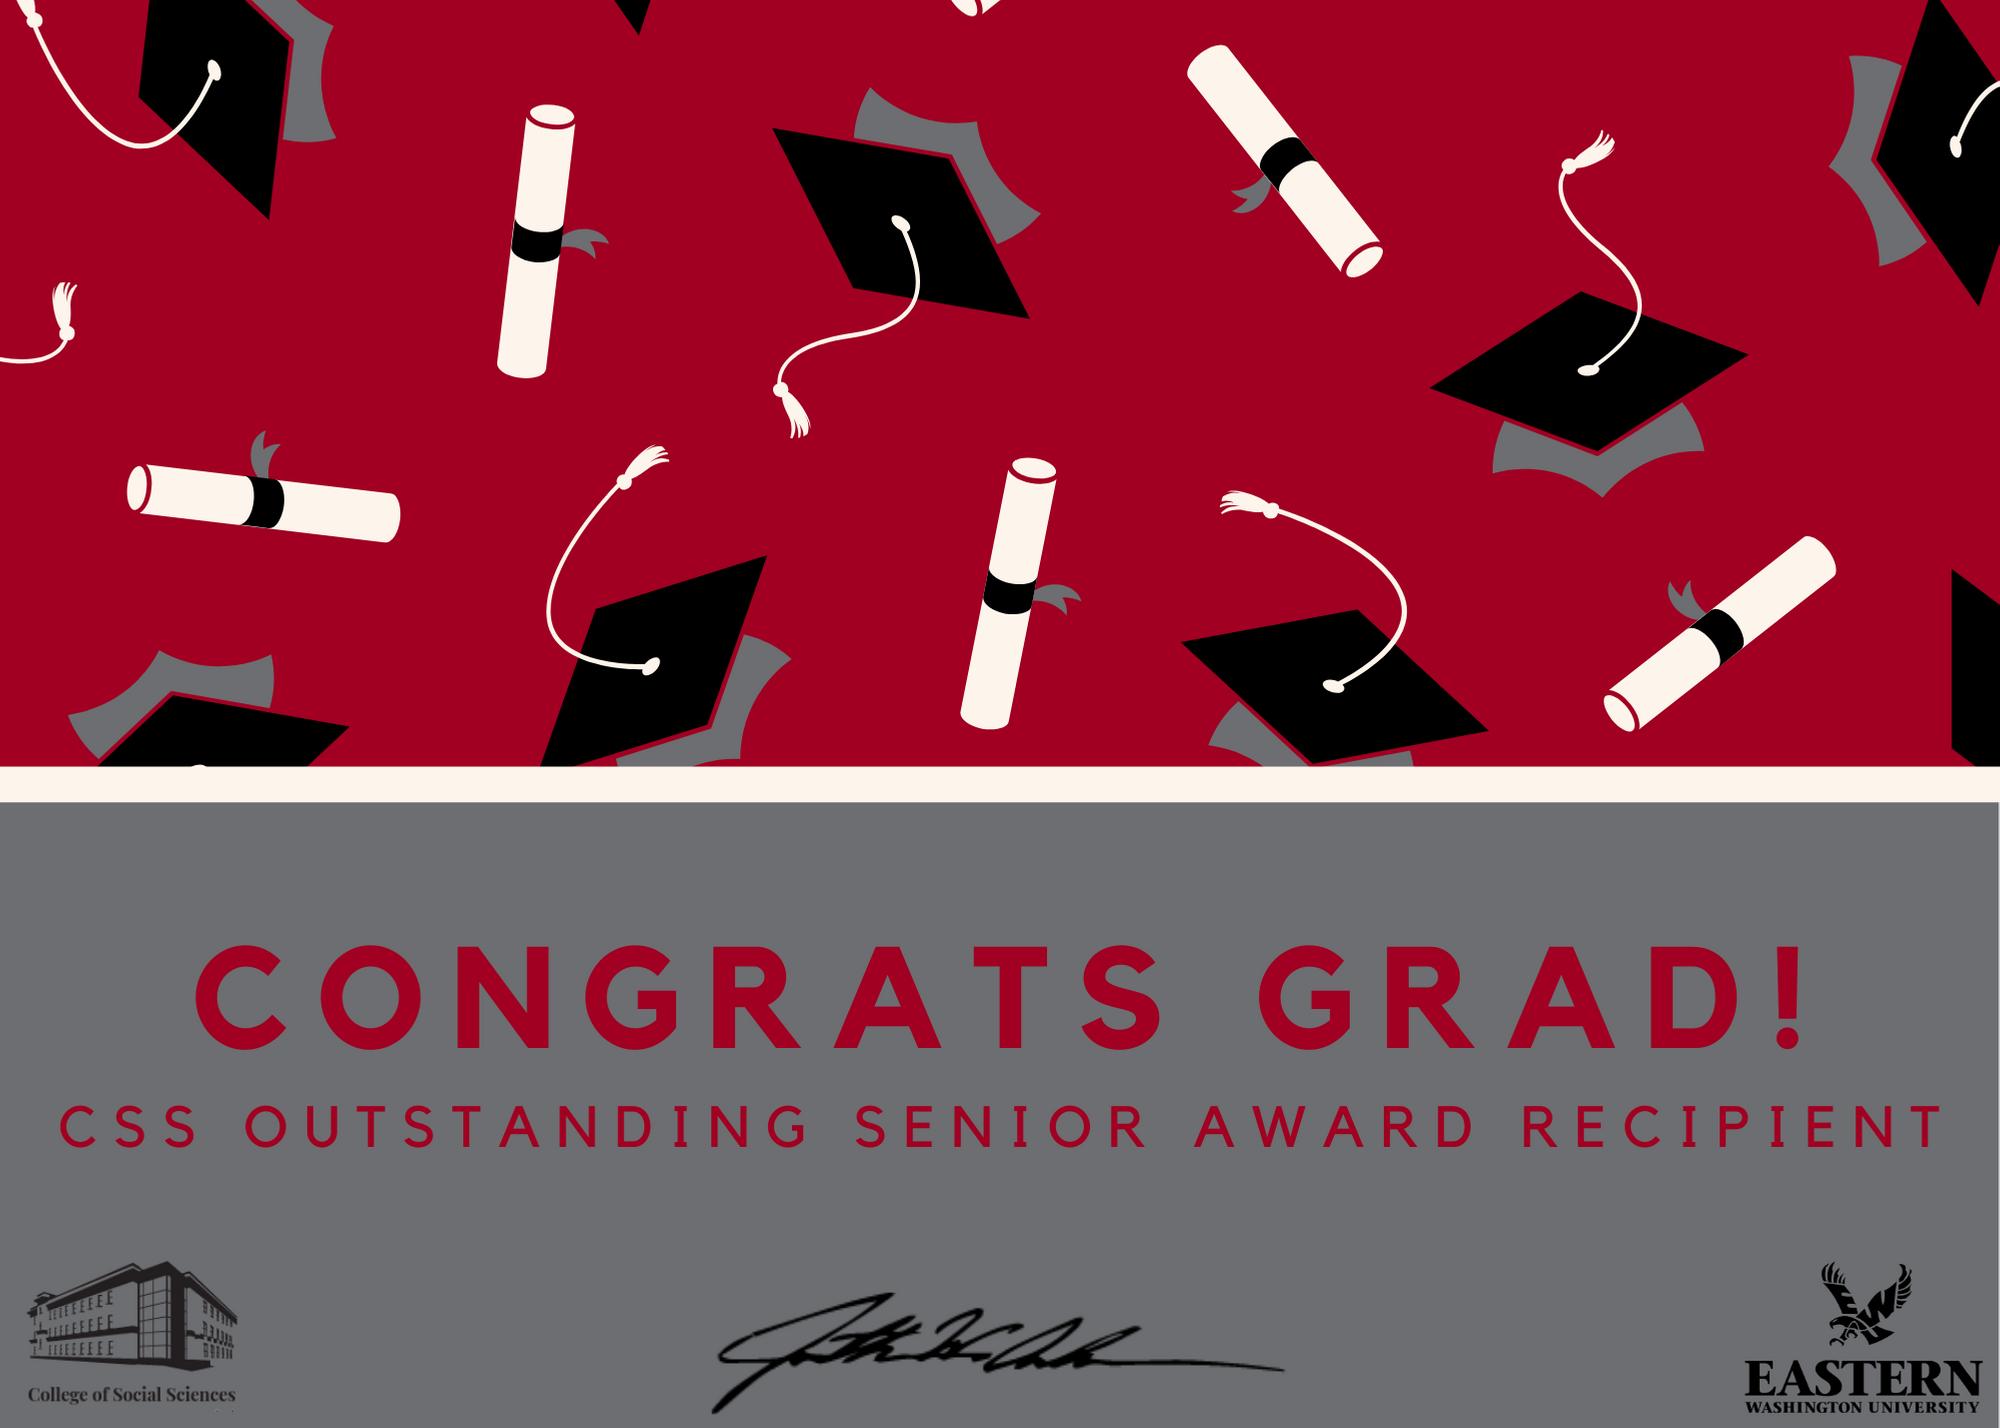 2497-caps-and-diplomas-pattern-graduation-card-2.png